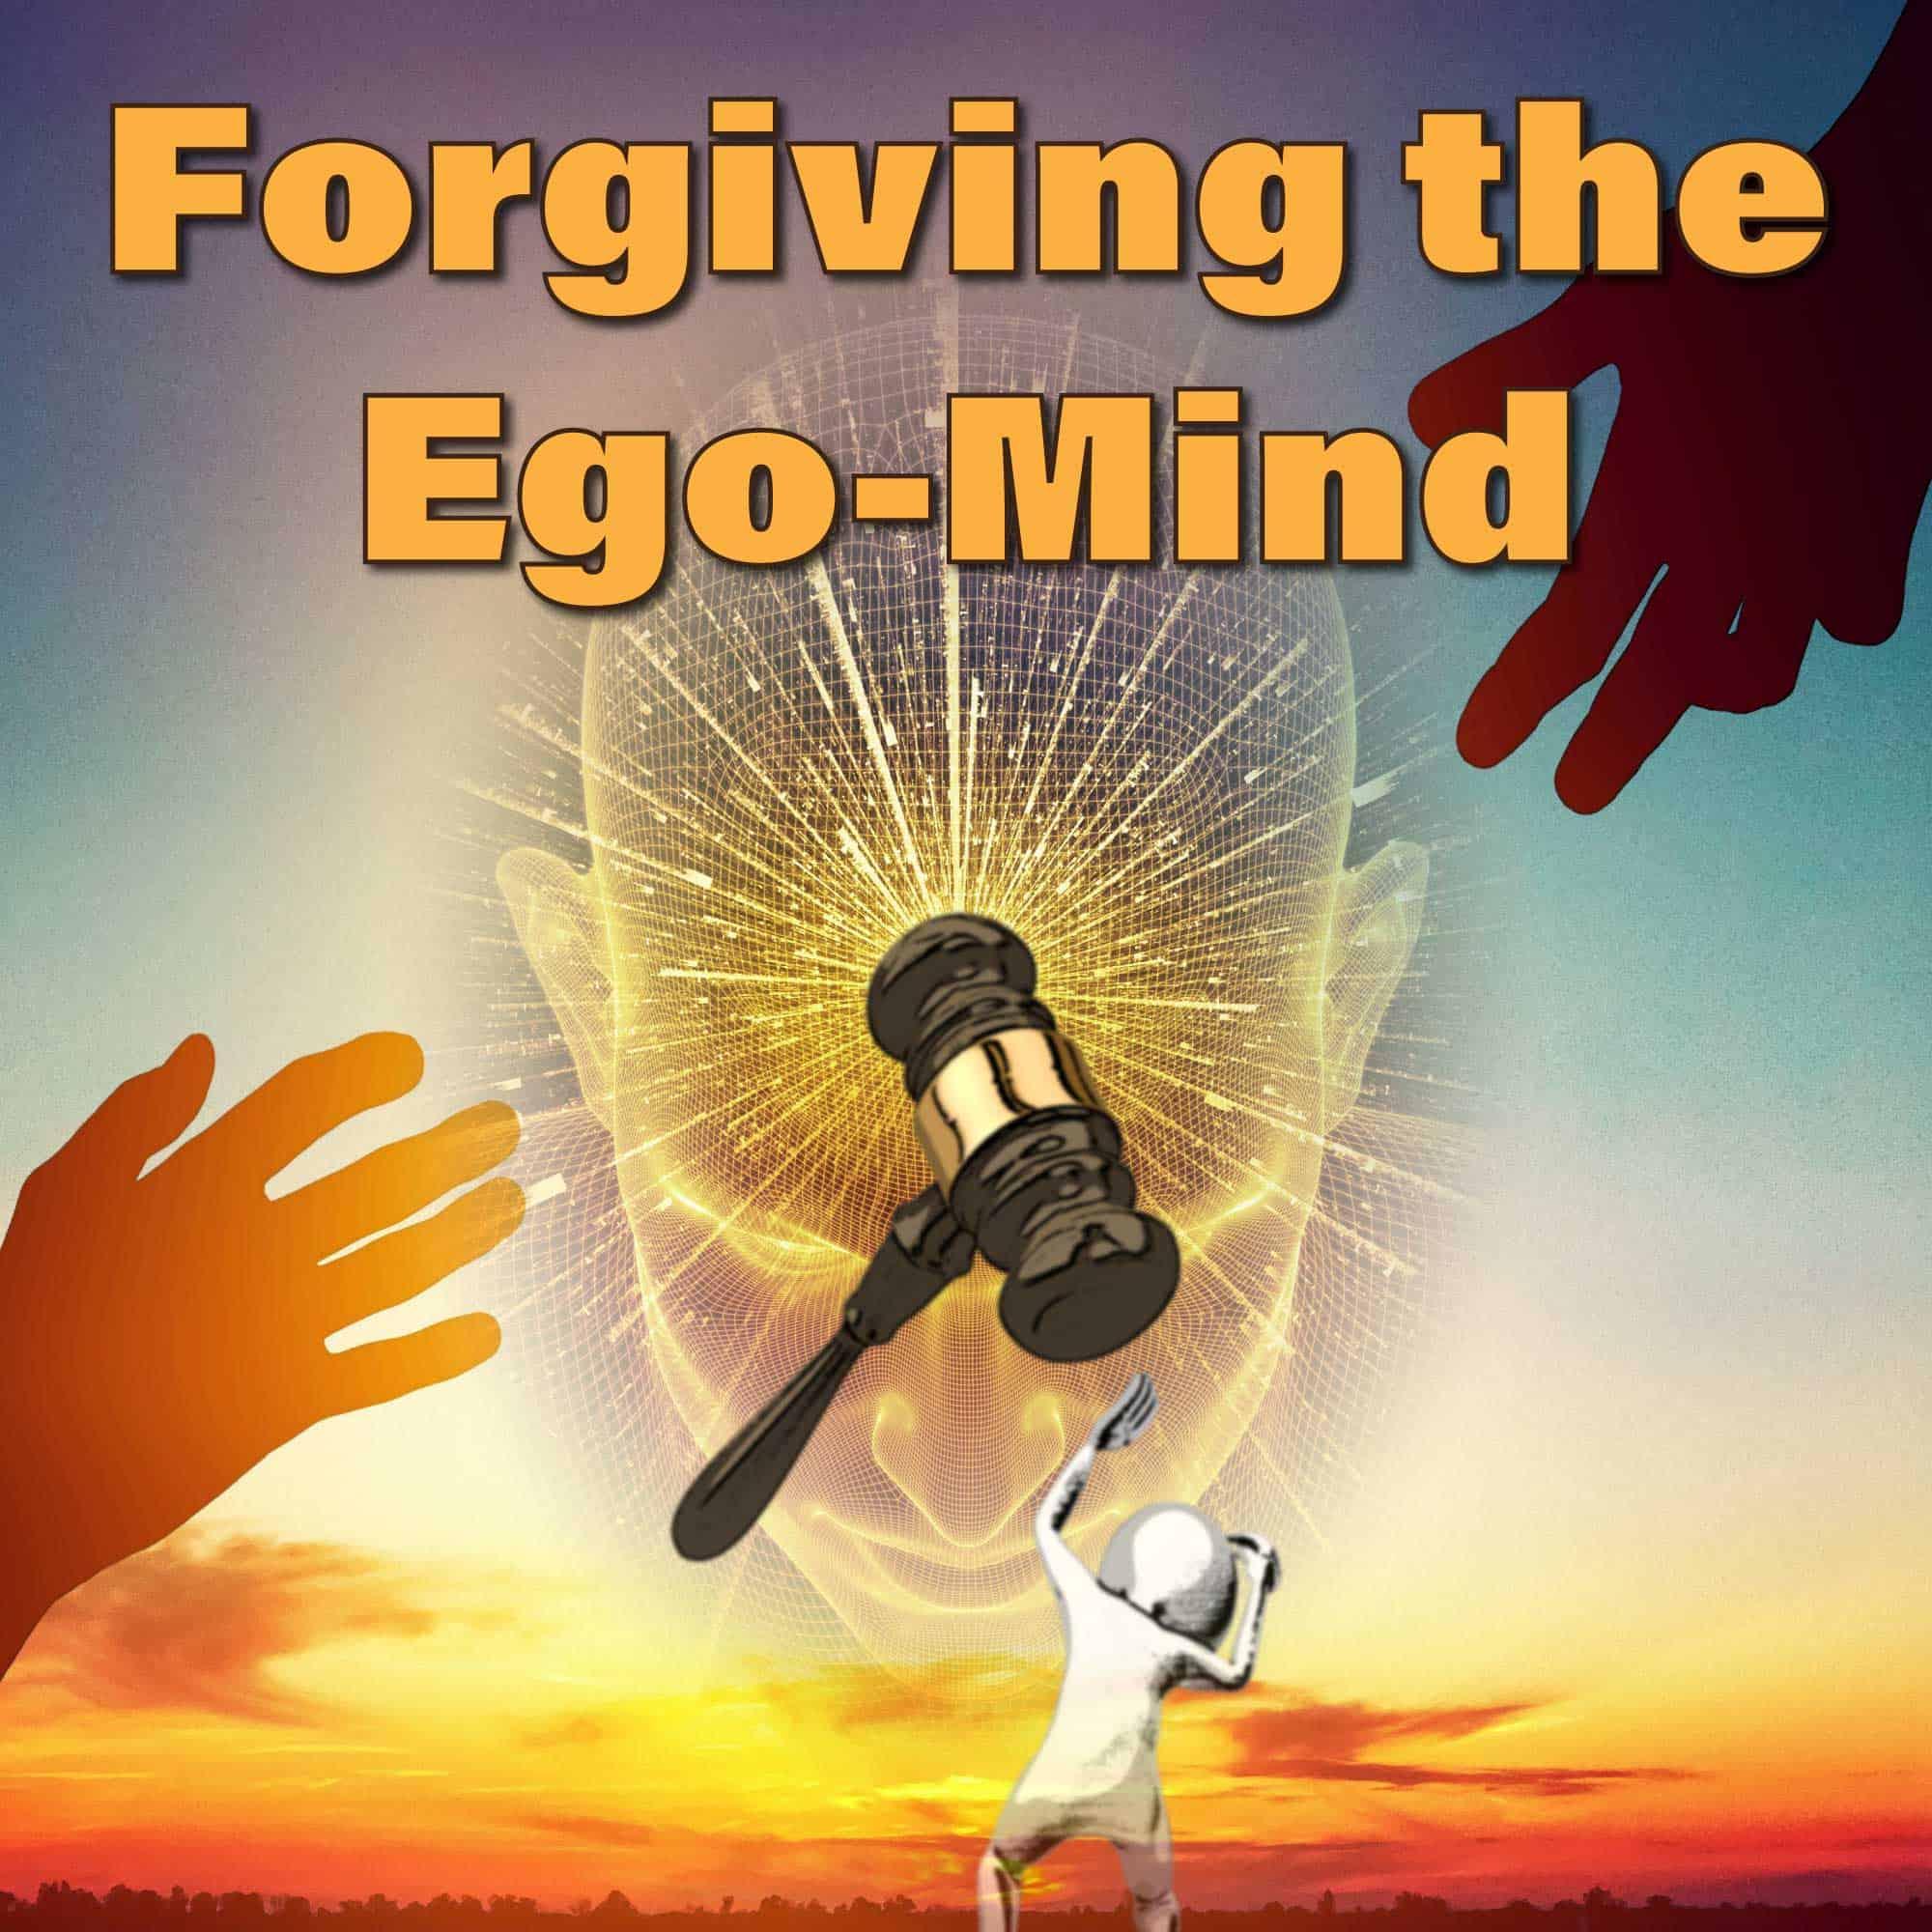 Forgiving the Ego-Mind